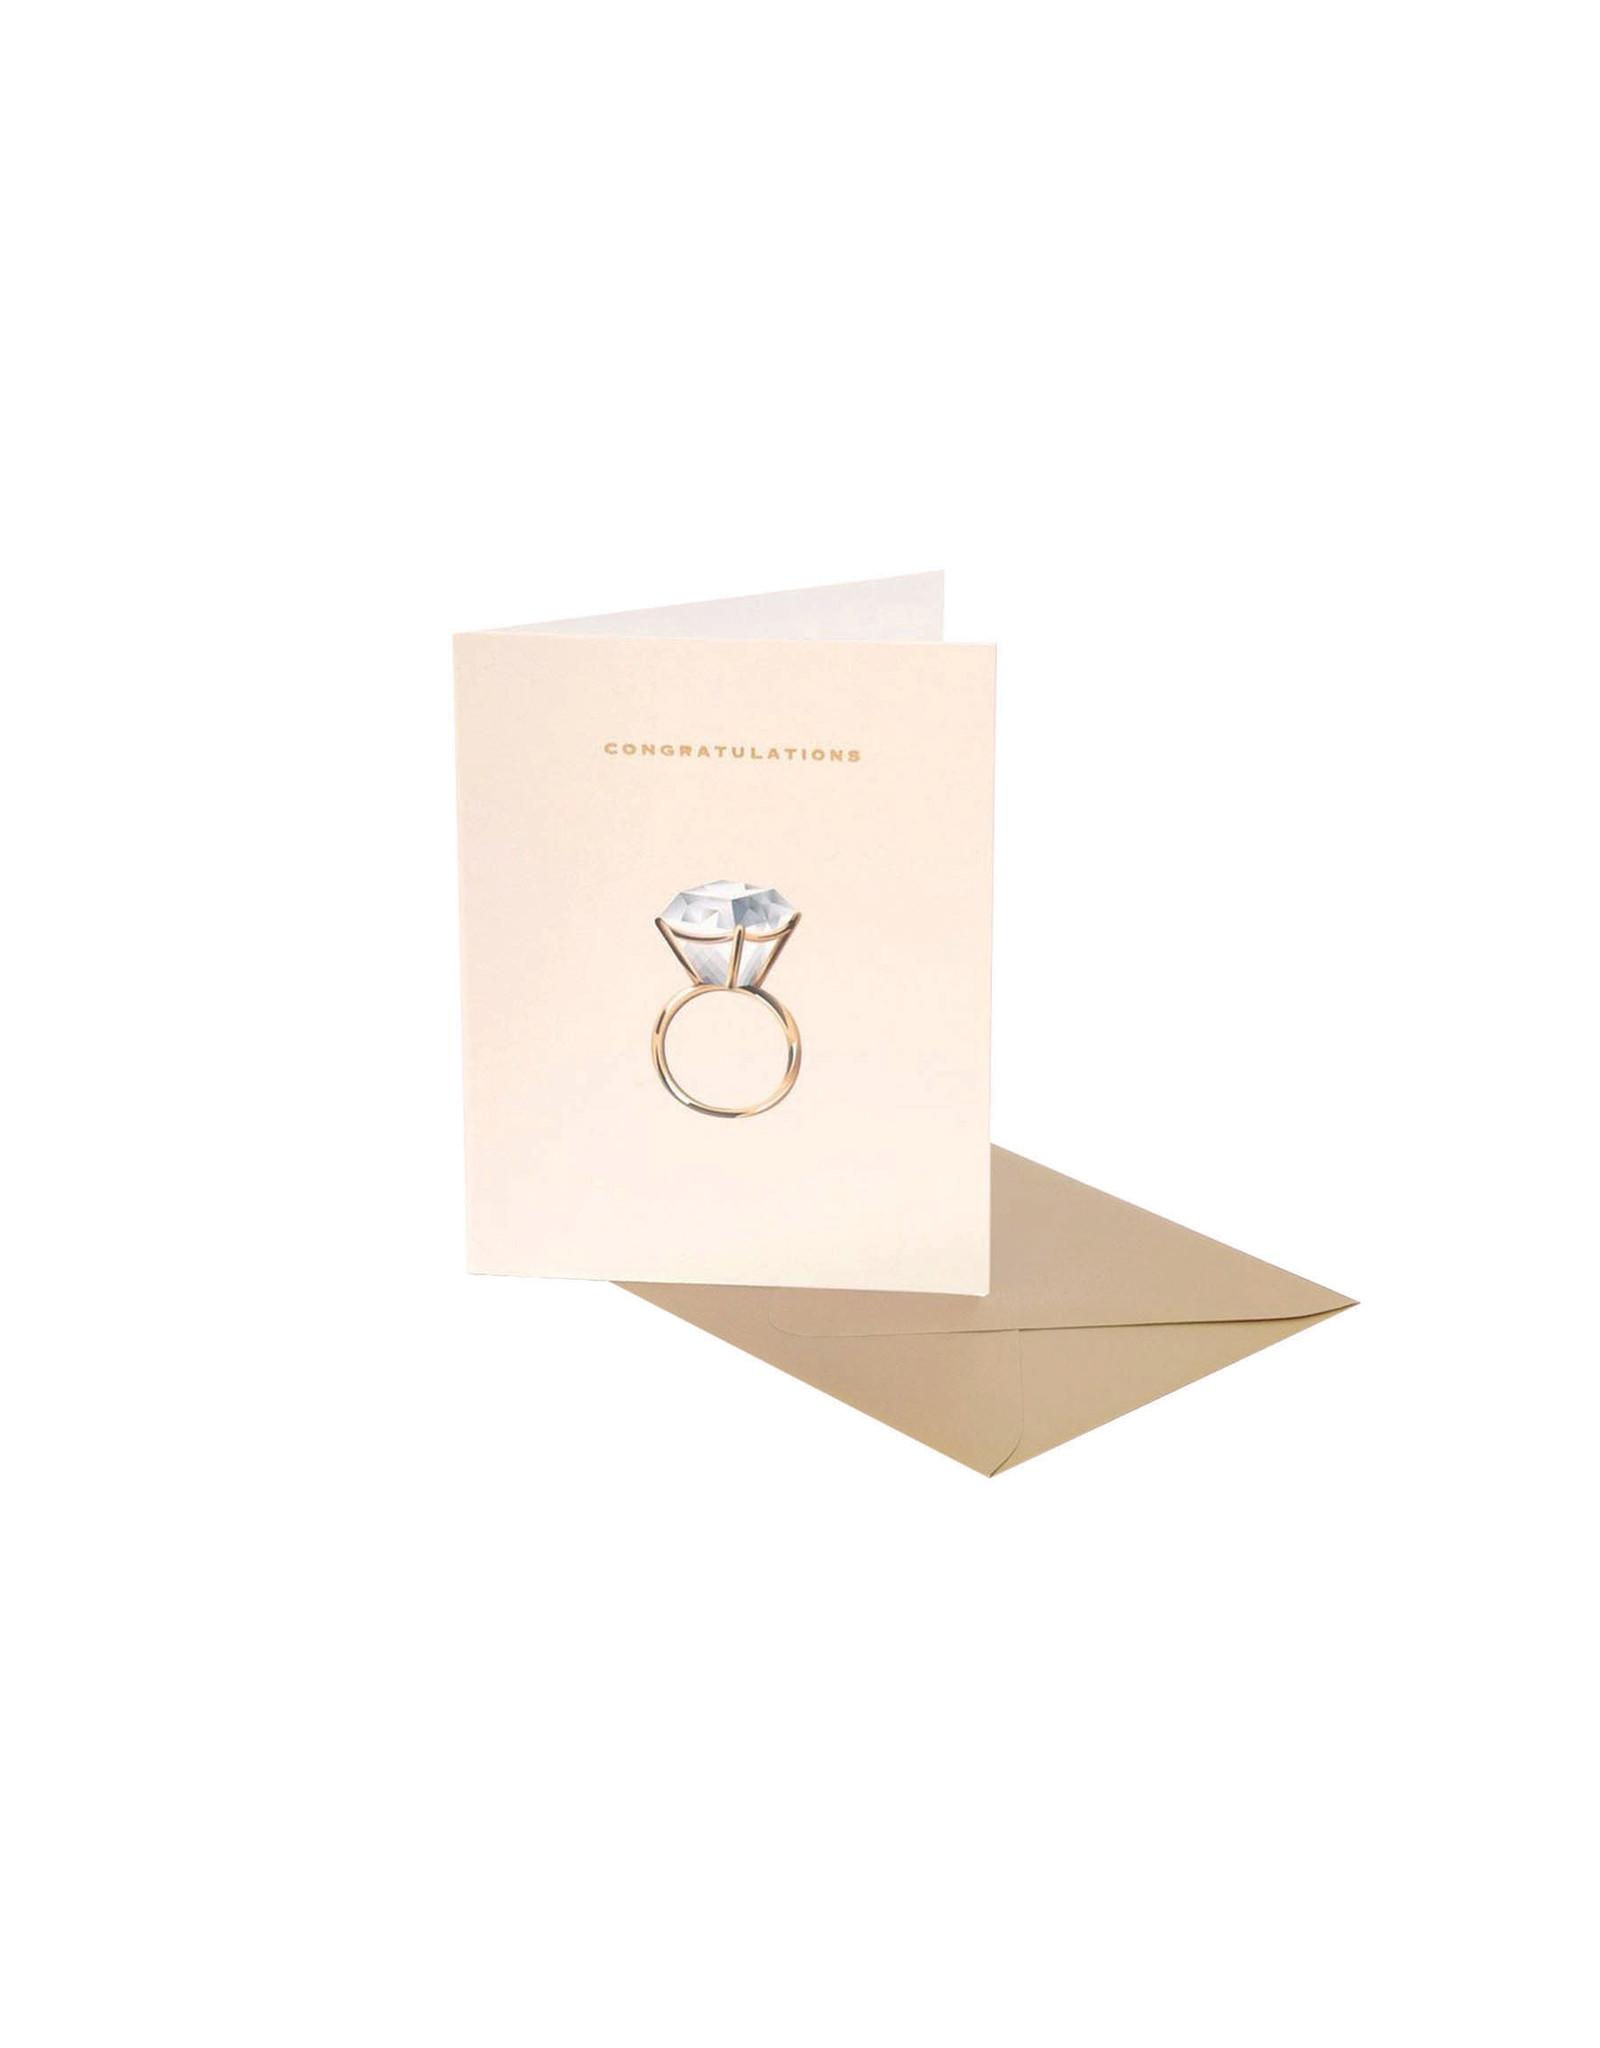 Clap Clap Diamond Ring Congratulations Card